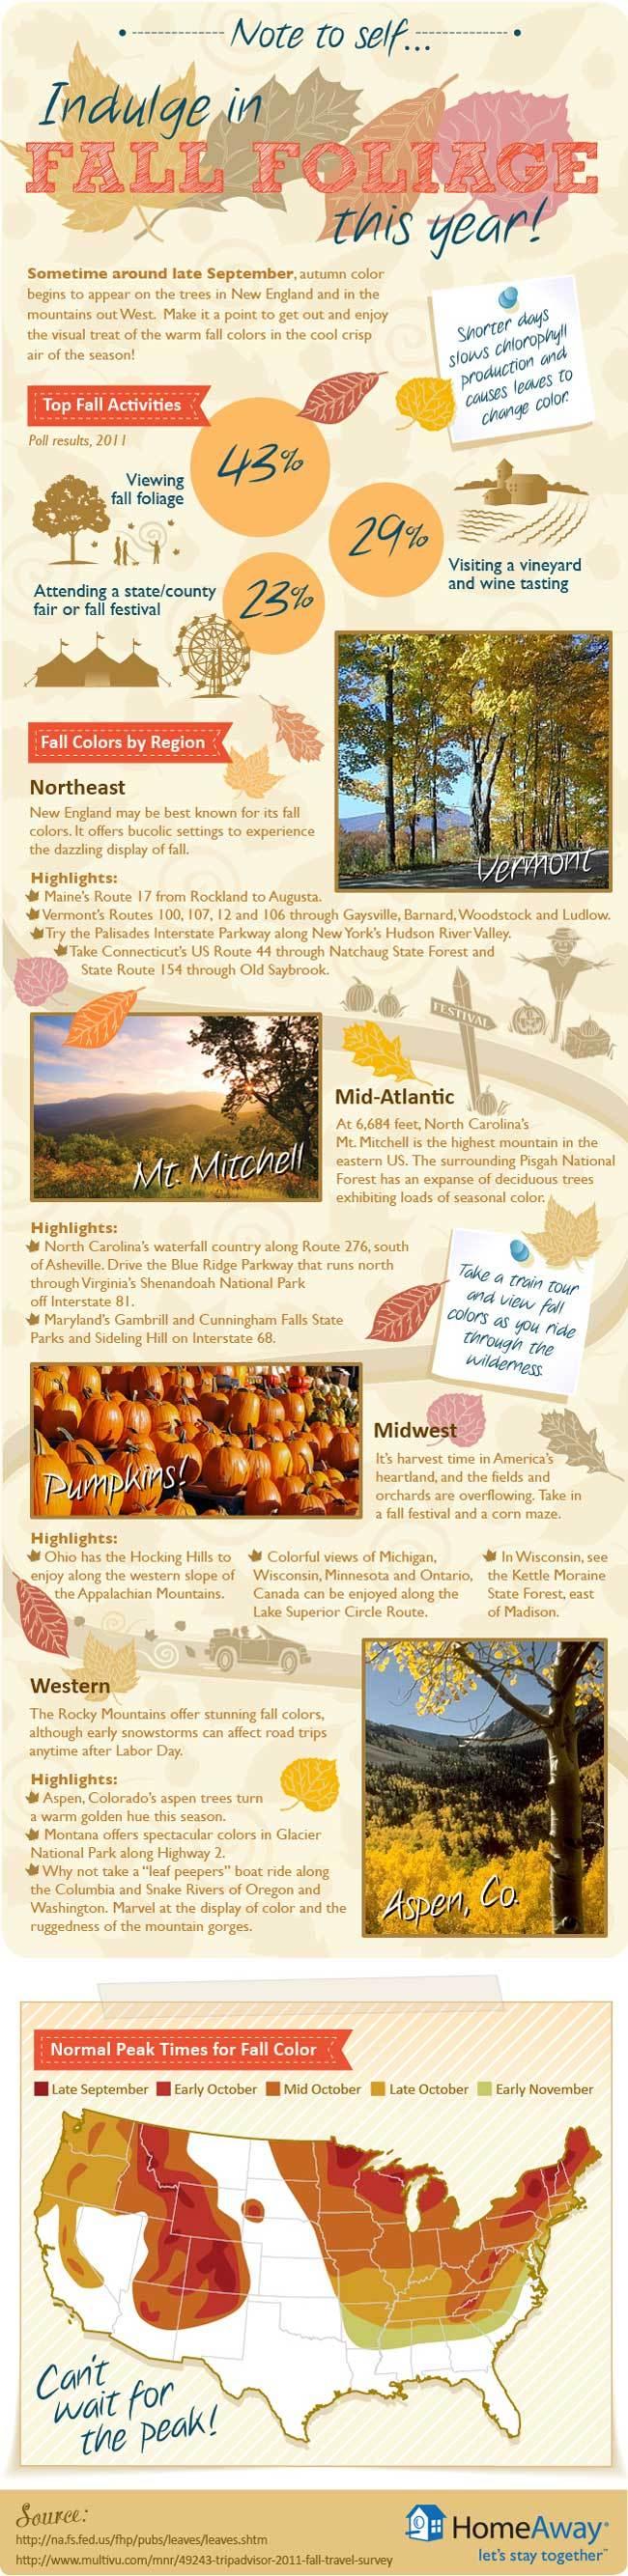 2012-09-11-FallFoliage.jpg